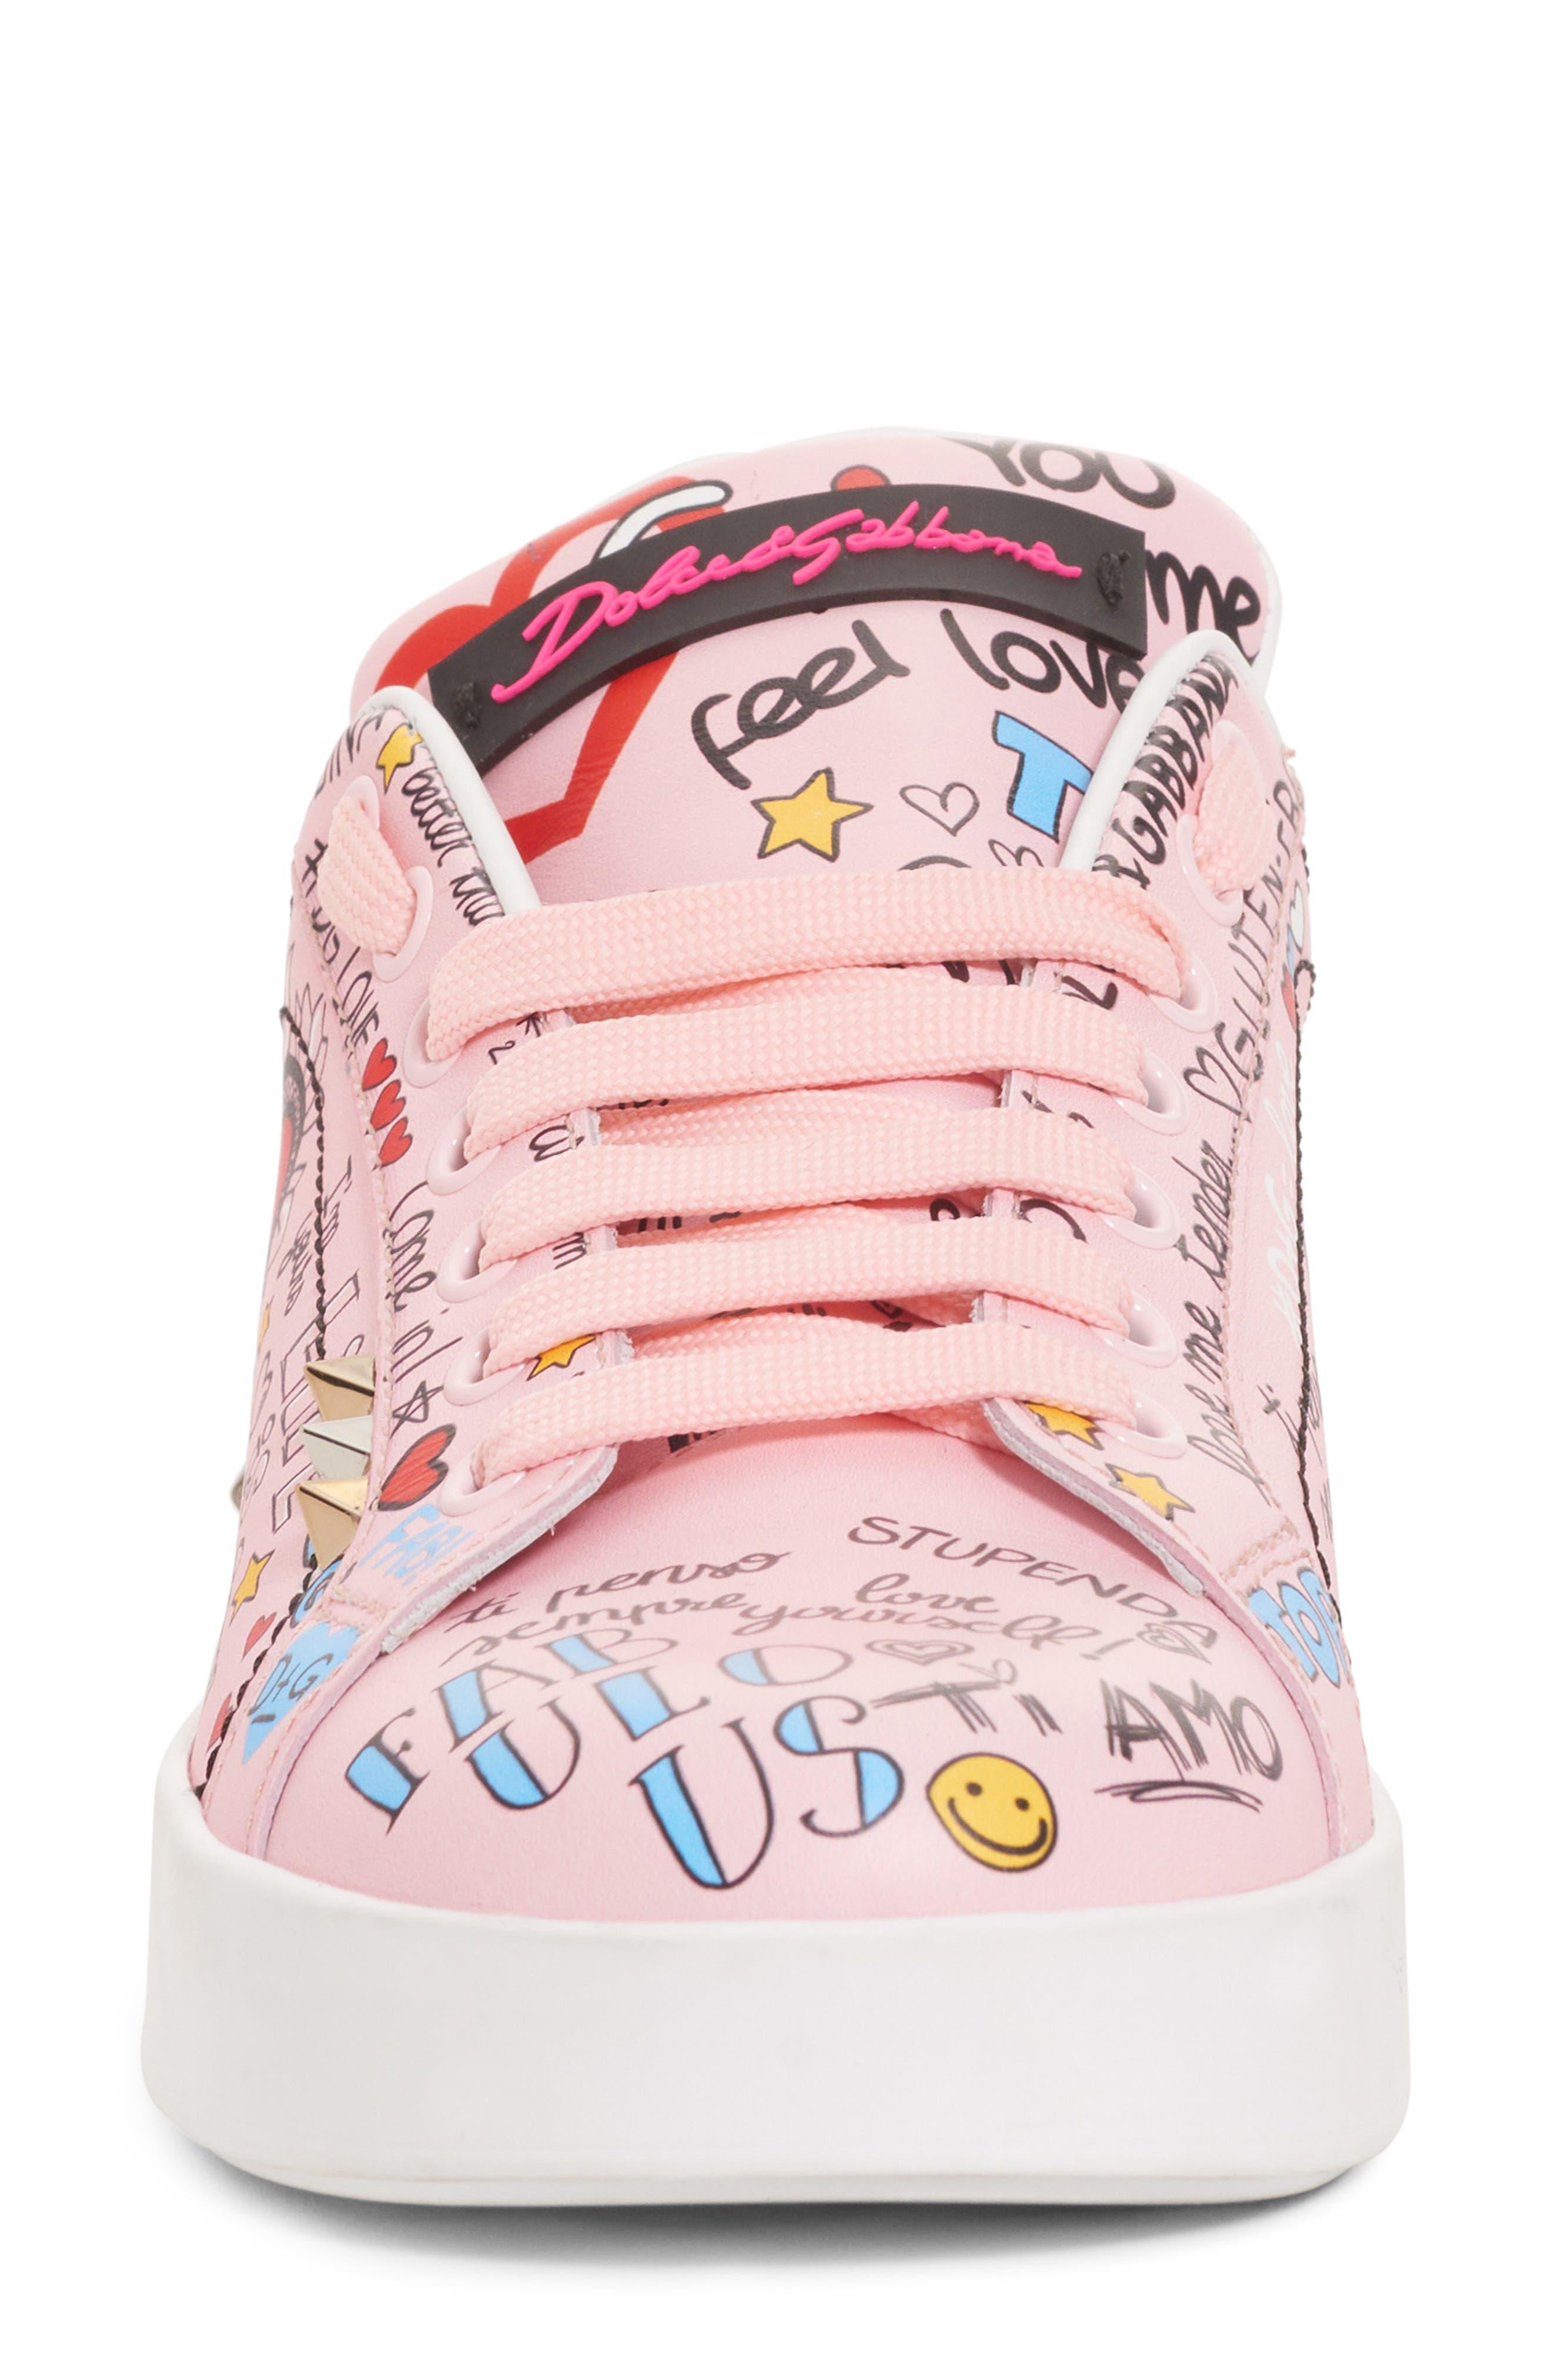 DOLCE&GABBANA,                             Mural Graffiti Sneaker,                             Alternate thumbnail 4, color,                             690